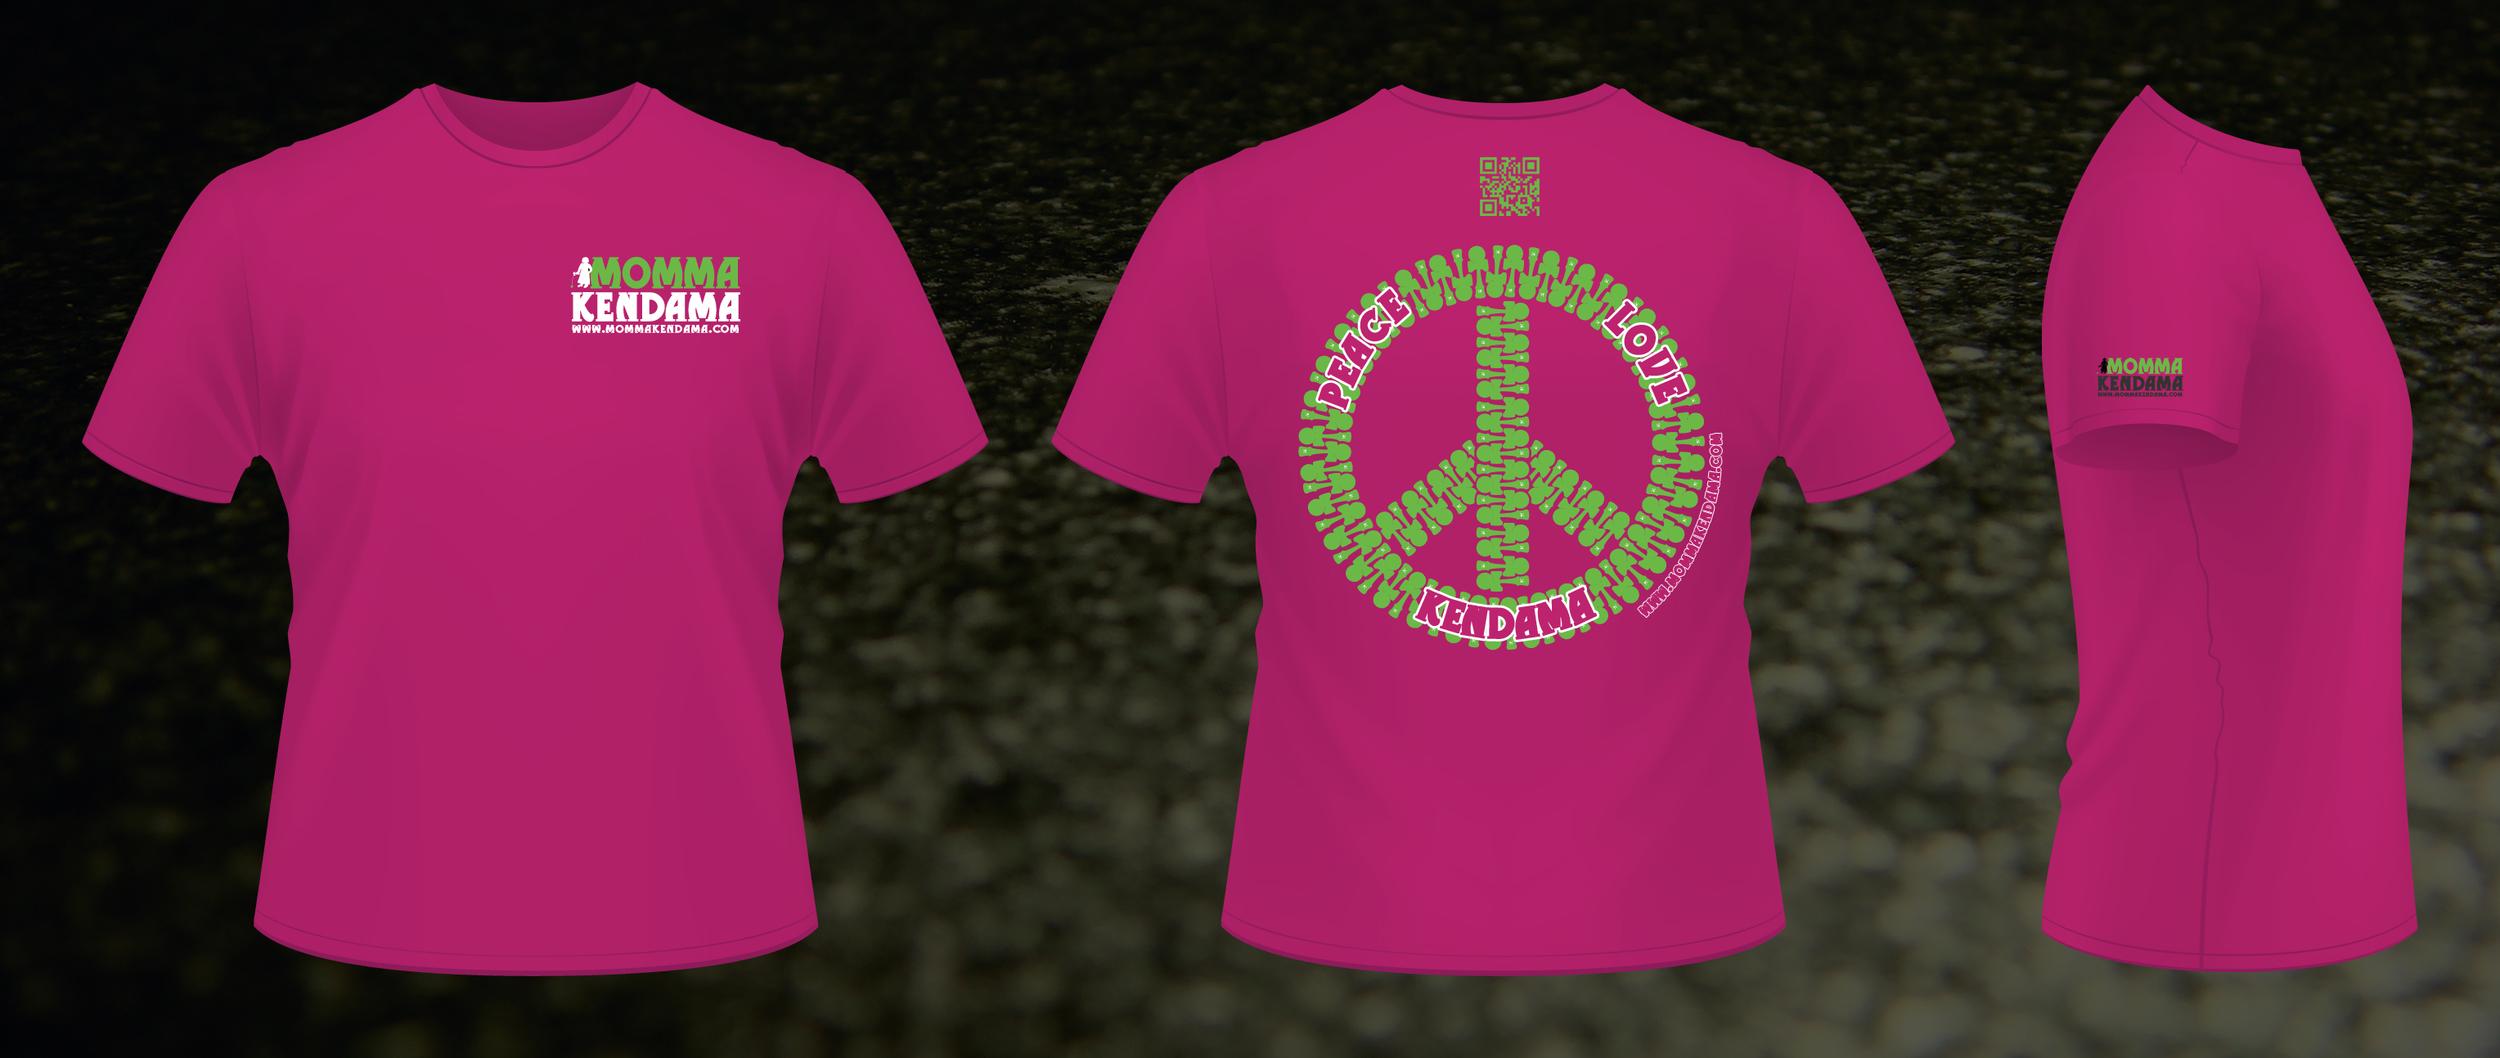 'peace. love. kendama.' t-shirt